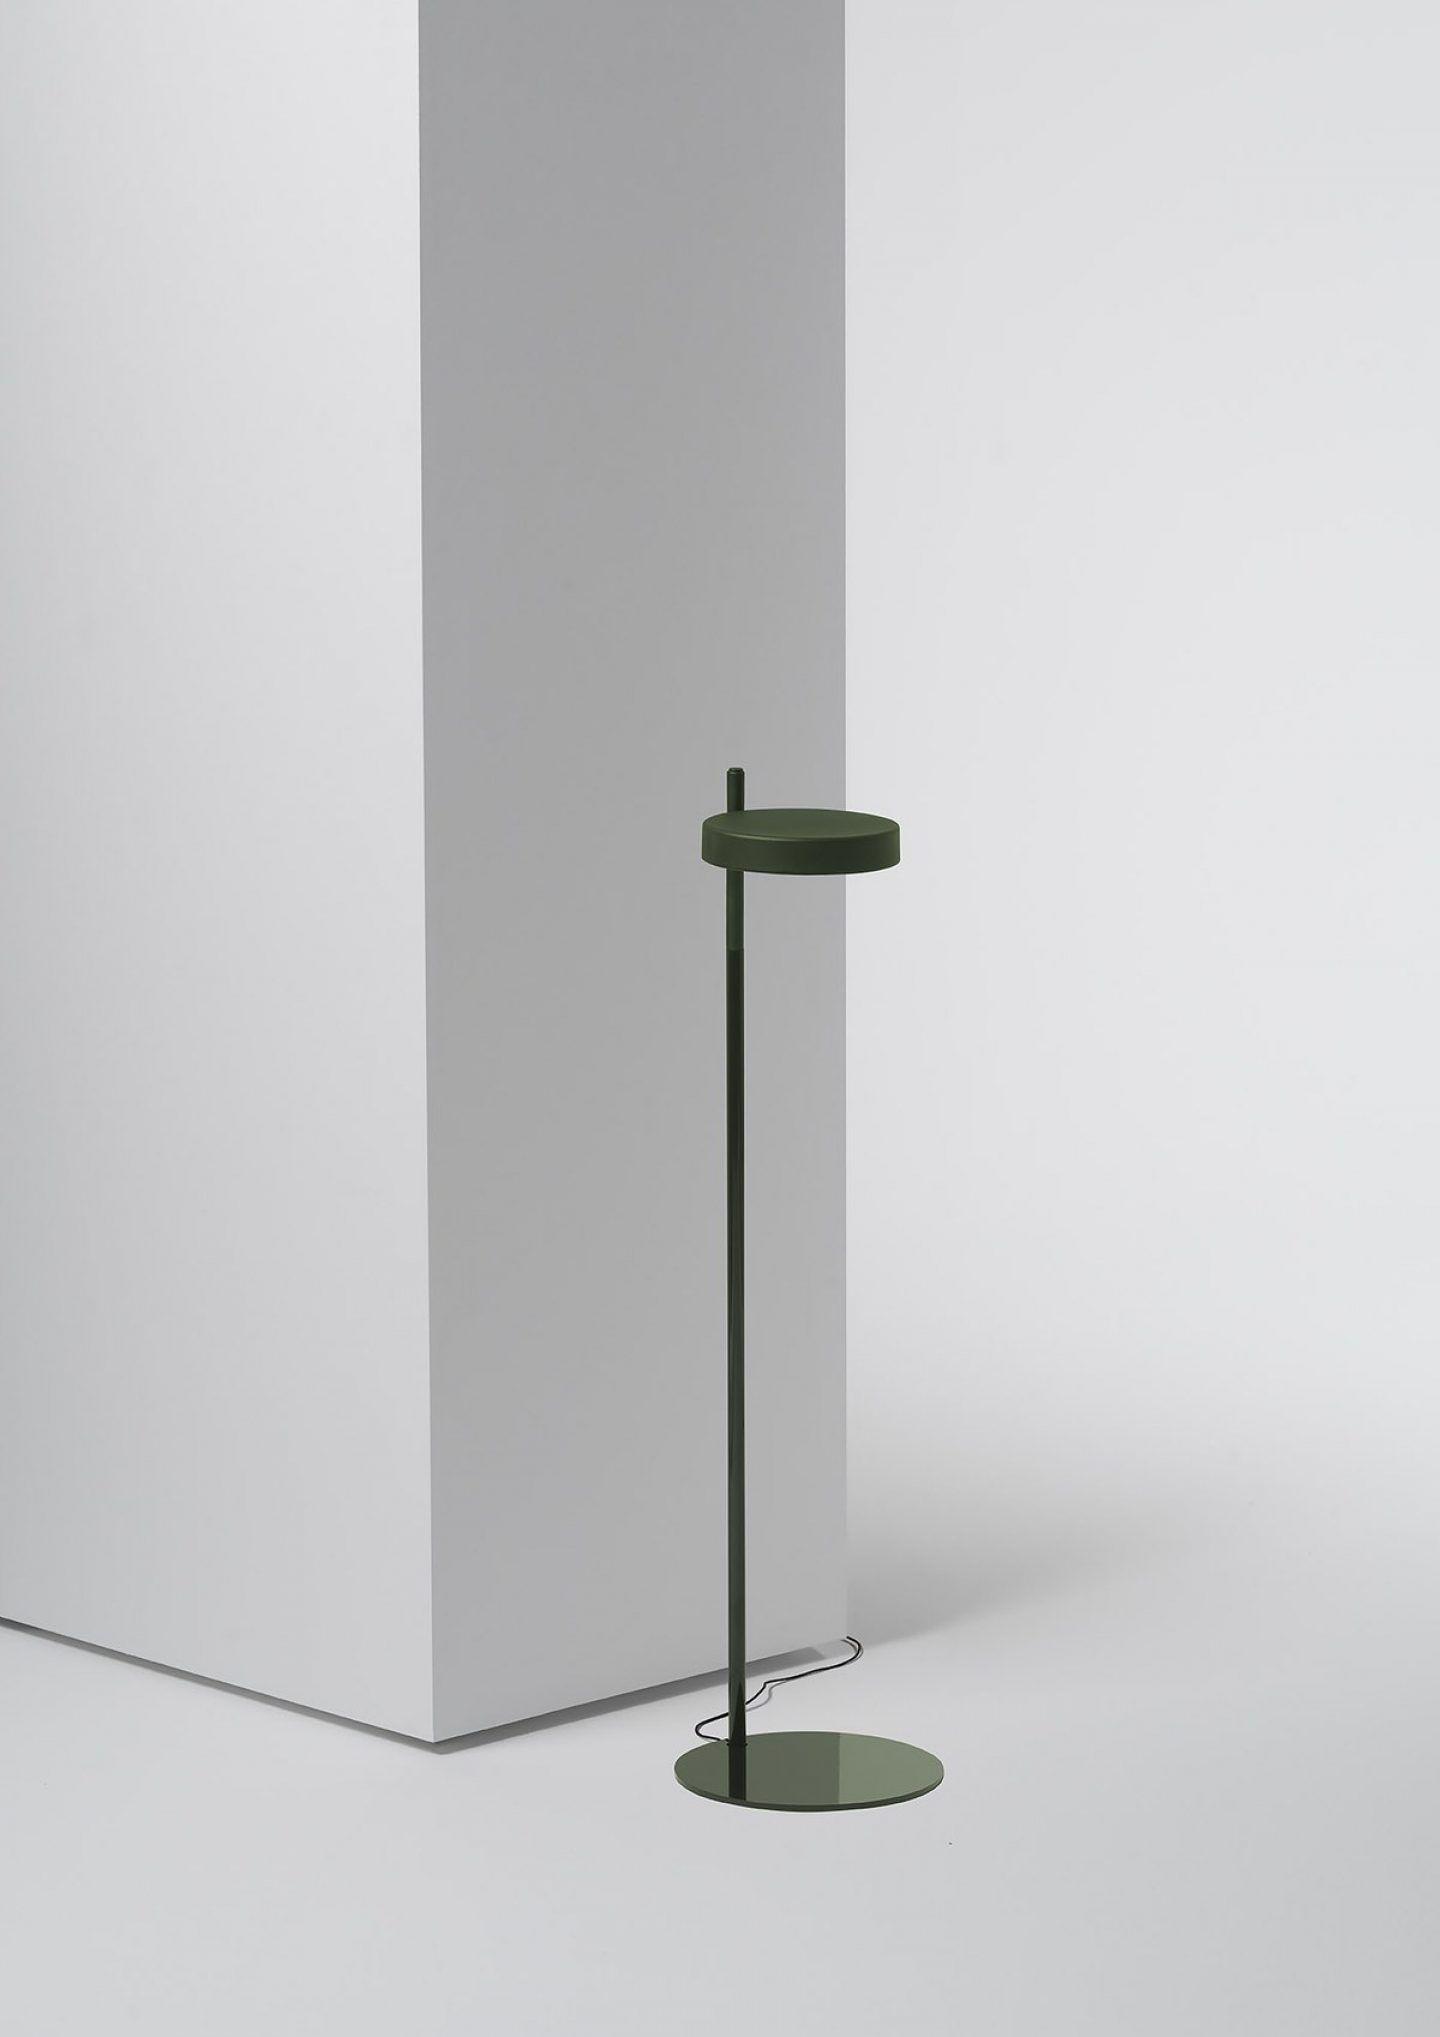 IGNANT-Design-Wastberg-w182-Pastille-07